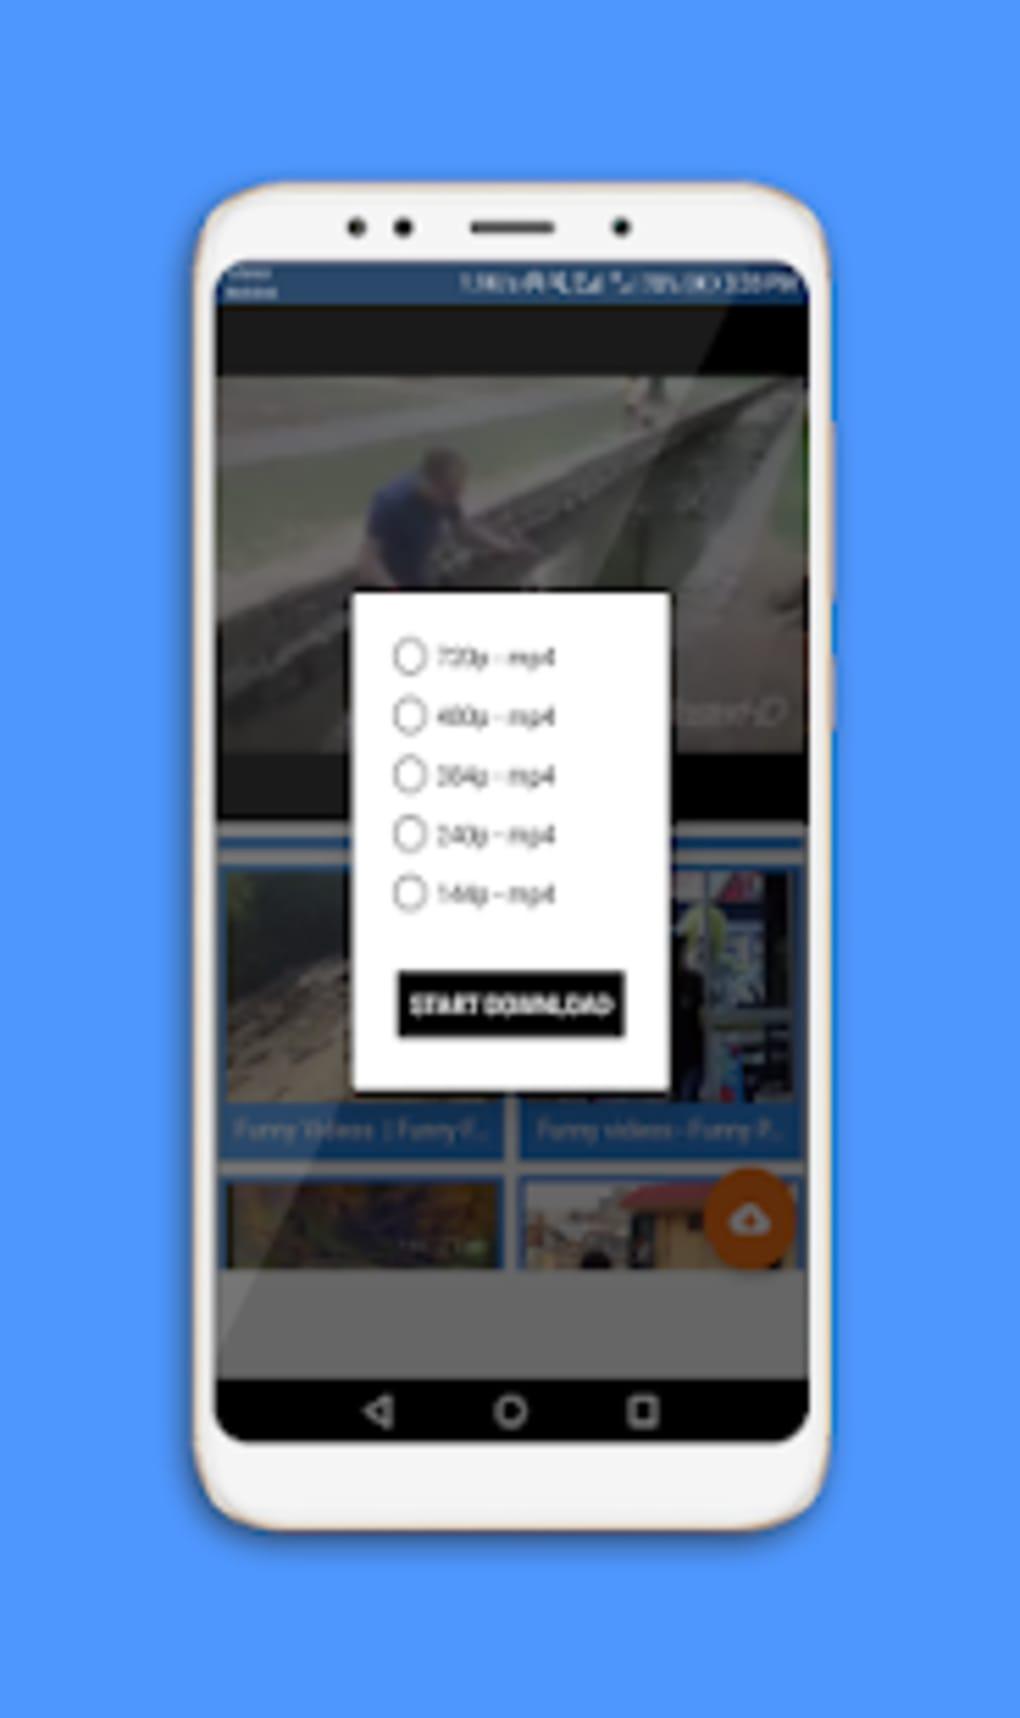 All HD Video Downloader - 4k Video Downloader for Android - Download